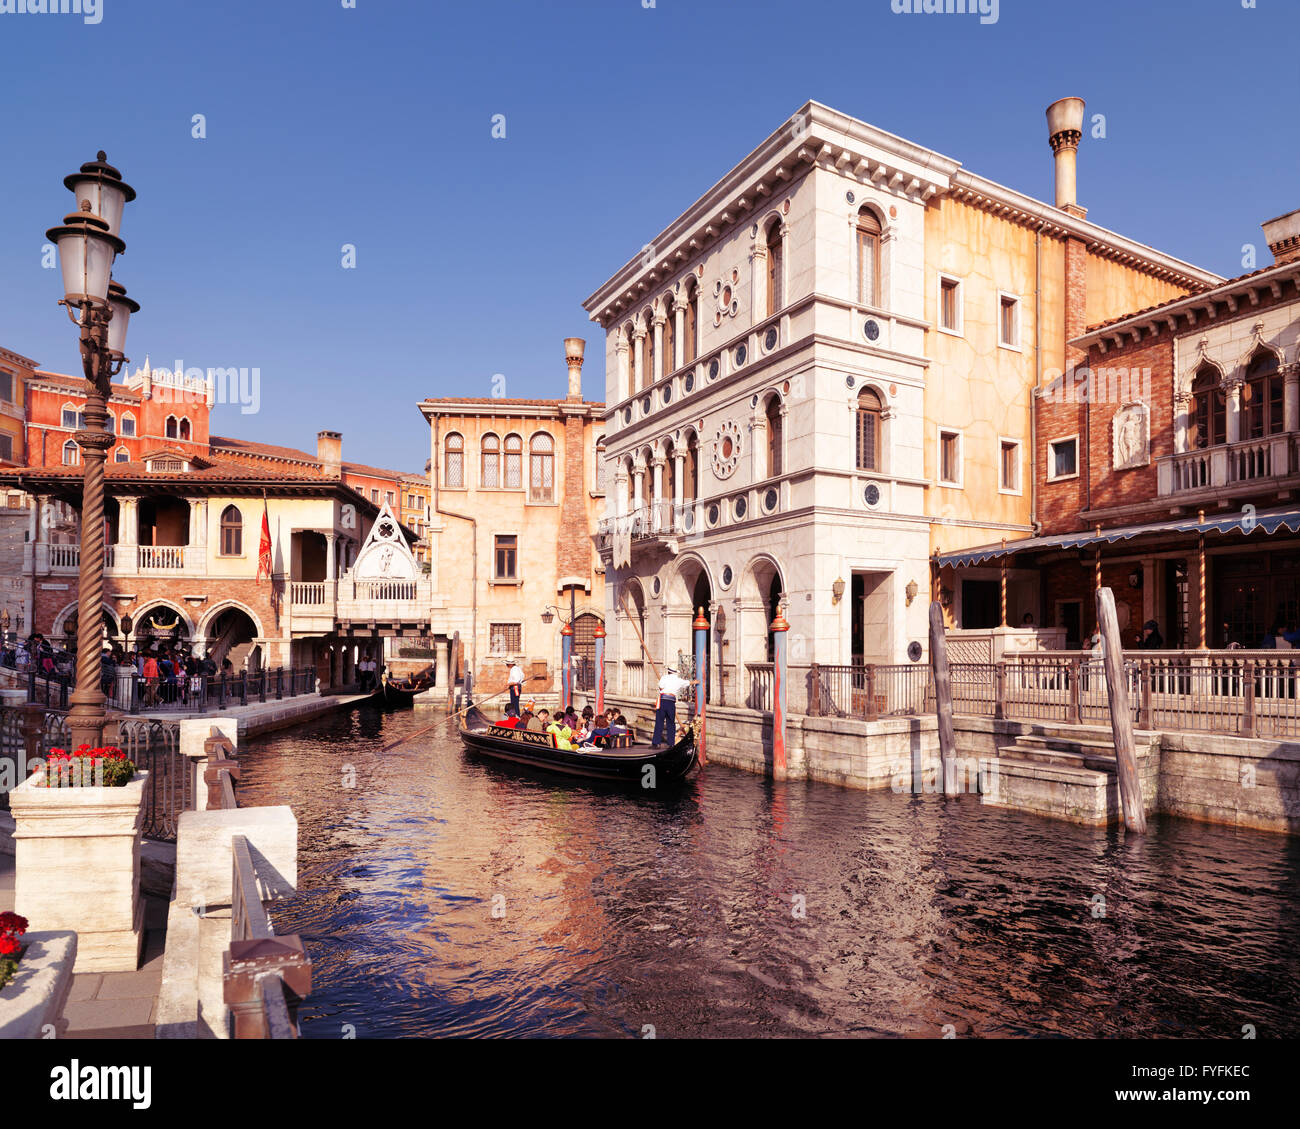 Venetian Style venetian style town, tokyo disneysea, tokyo disney resort, japan